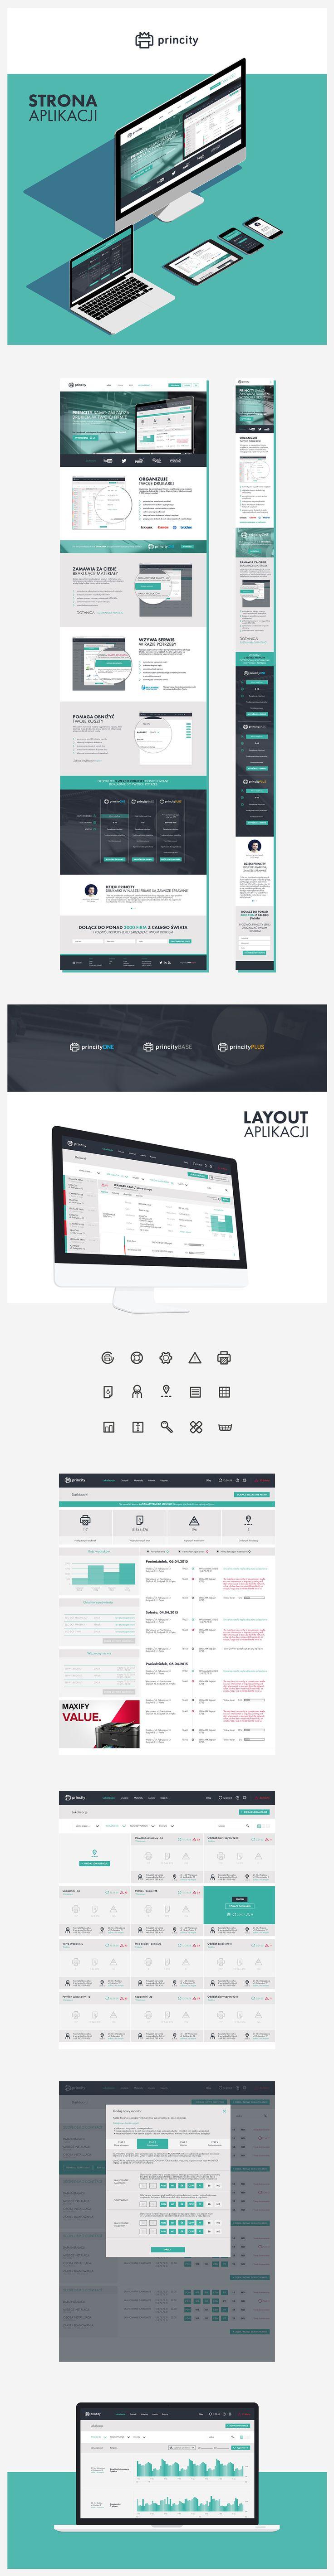 Princity #design #UI #website #web #webdesign #pleo